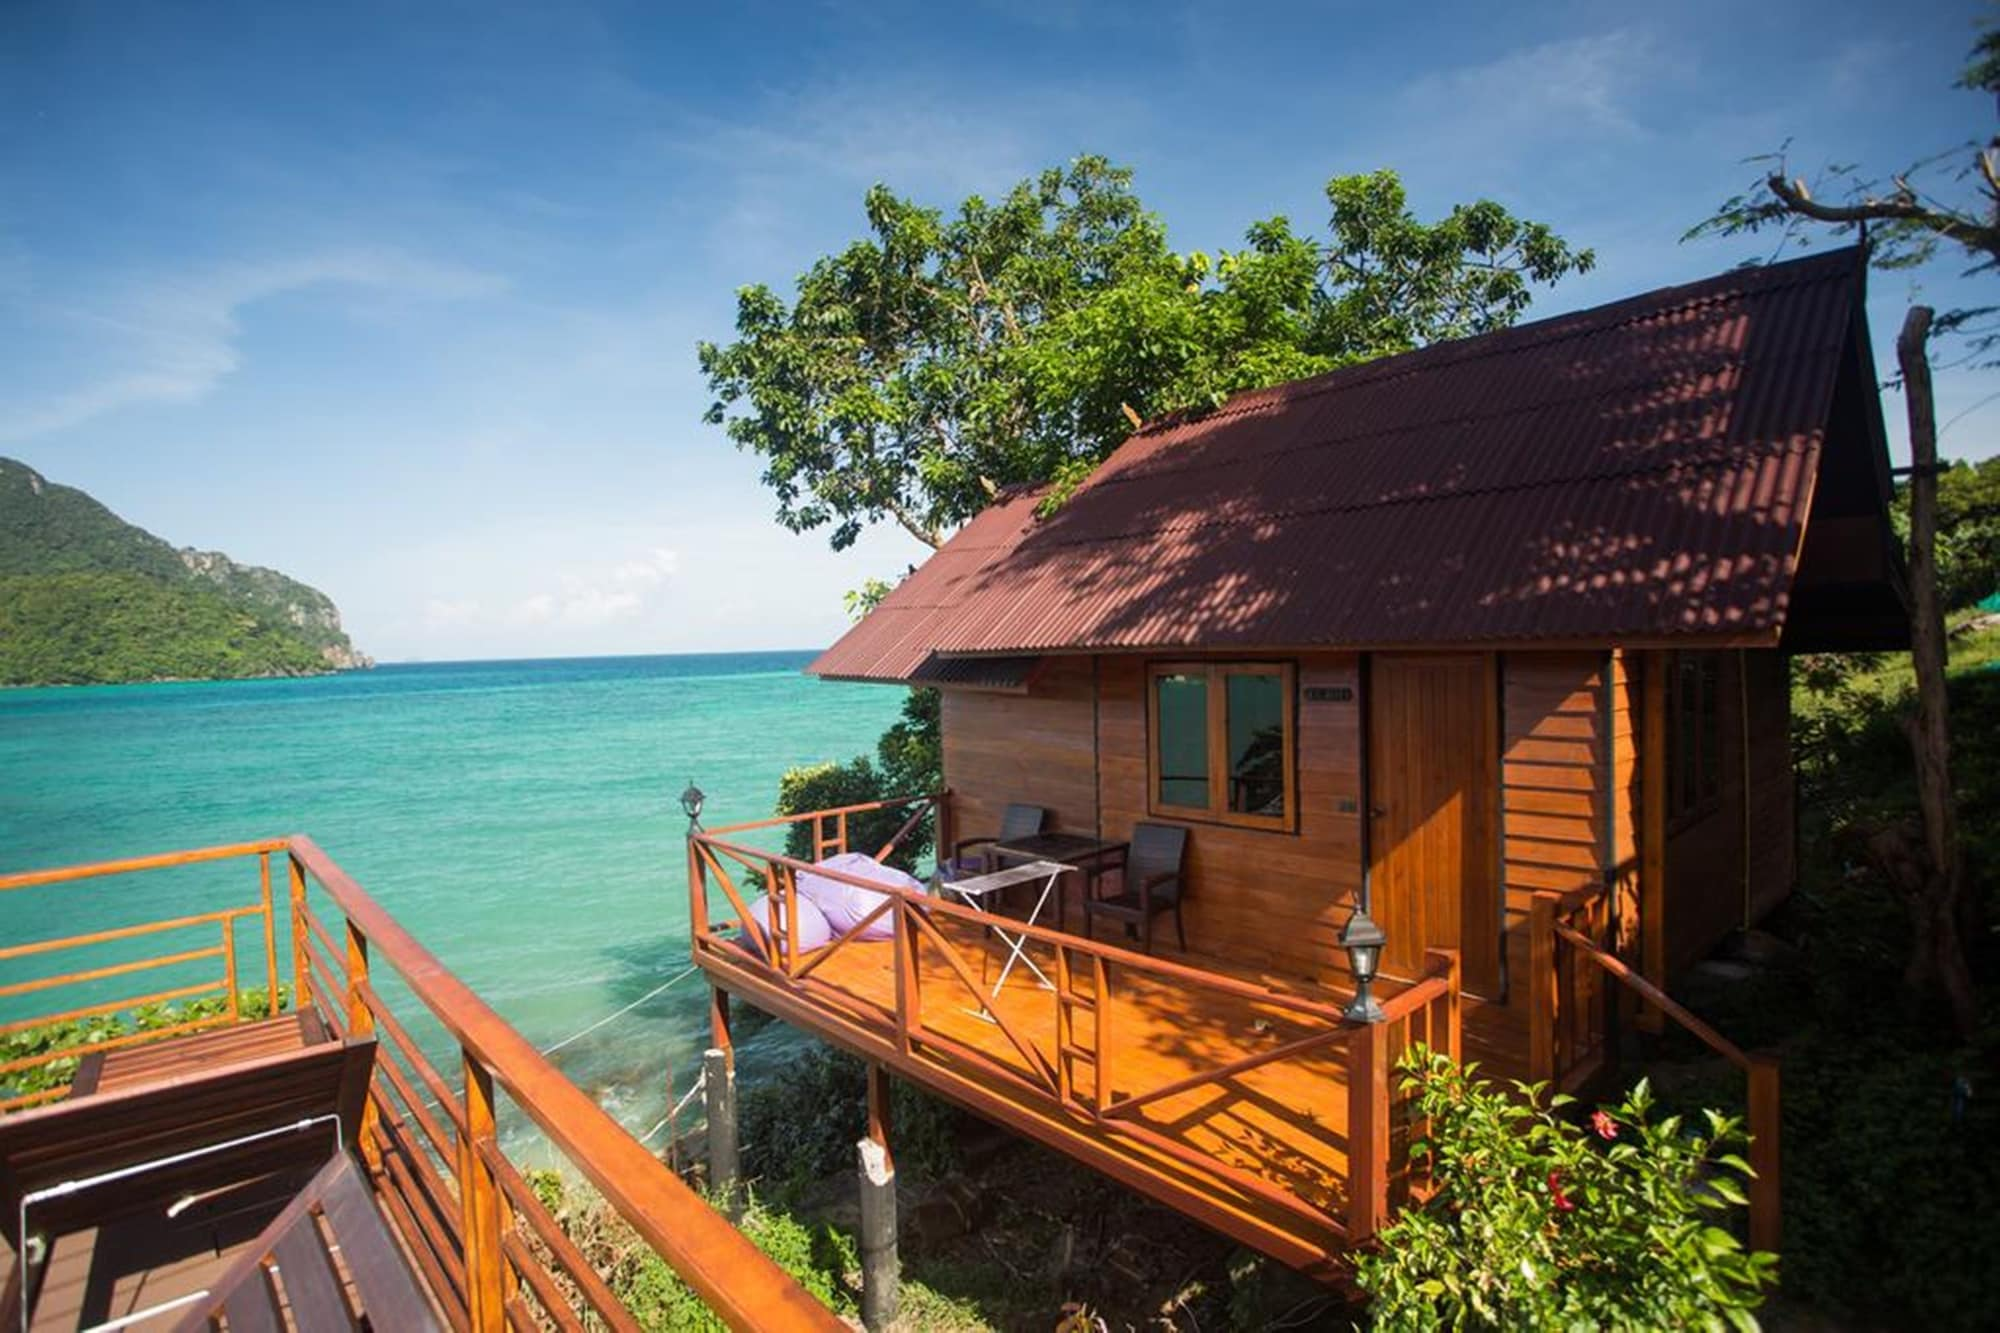 The Cobble Beach, Muang Krabi